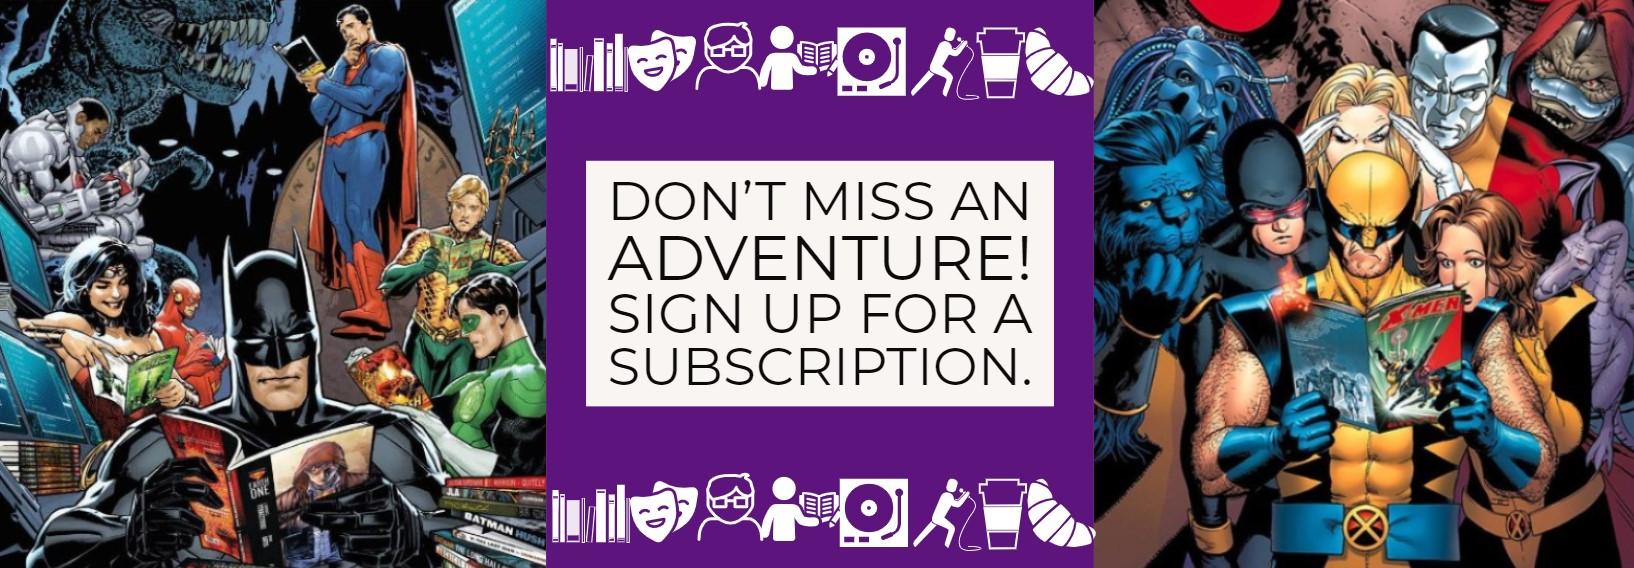 subscriptions-options-1-.jpg